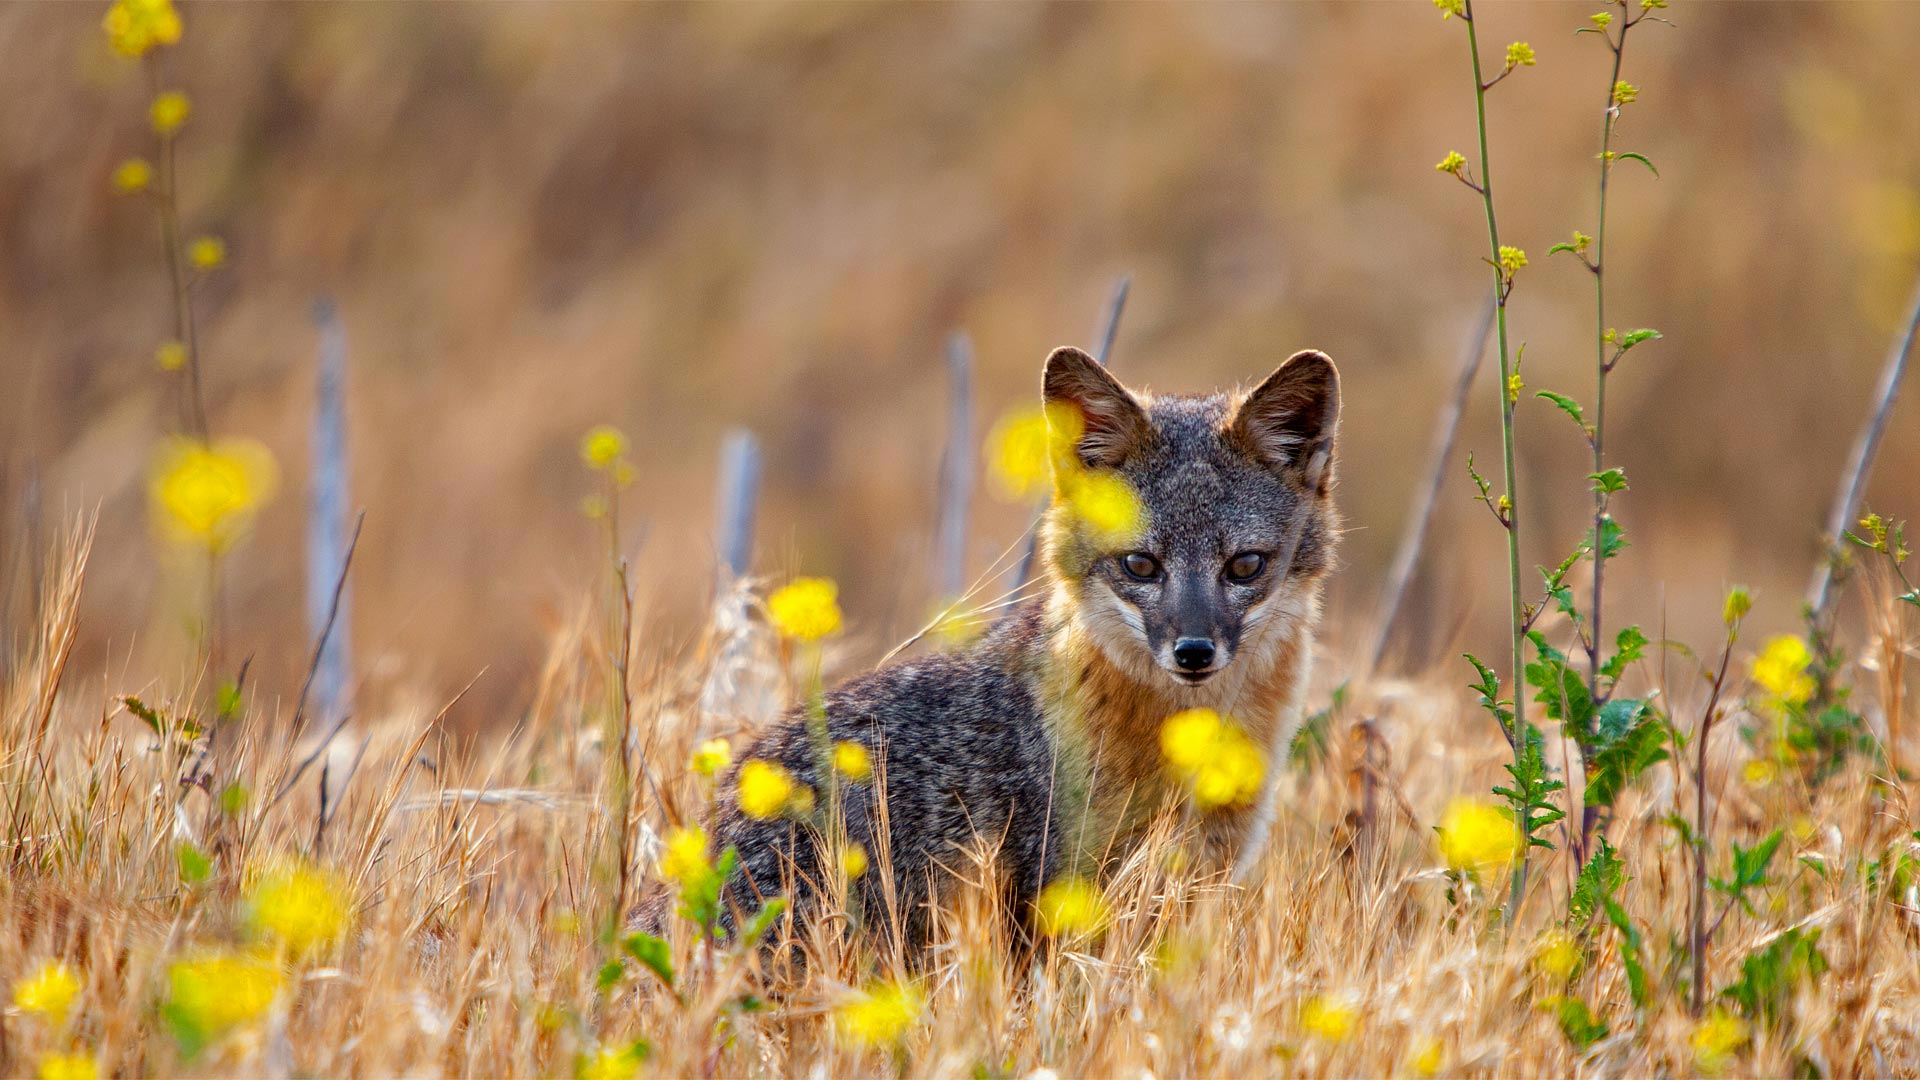 Island fox on Santa Cruz Island, Channel Islands National Park, California (© Ian Shive/Tandem Motion + Stills)(Bing United States)